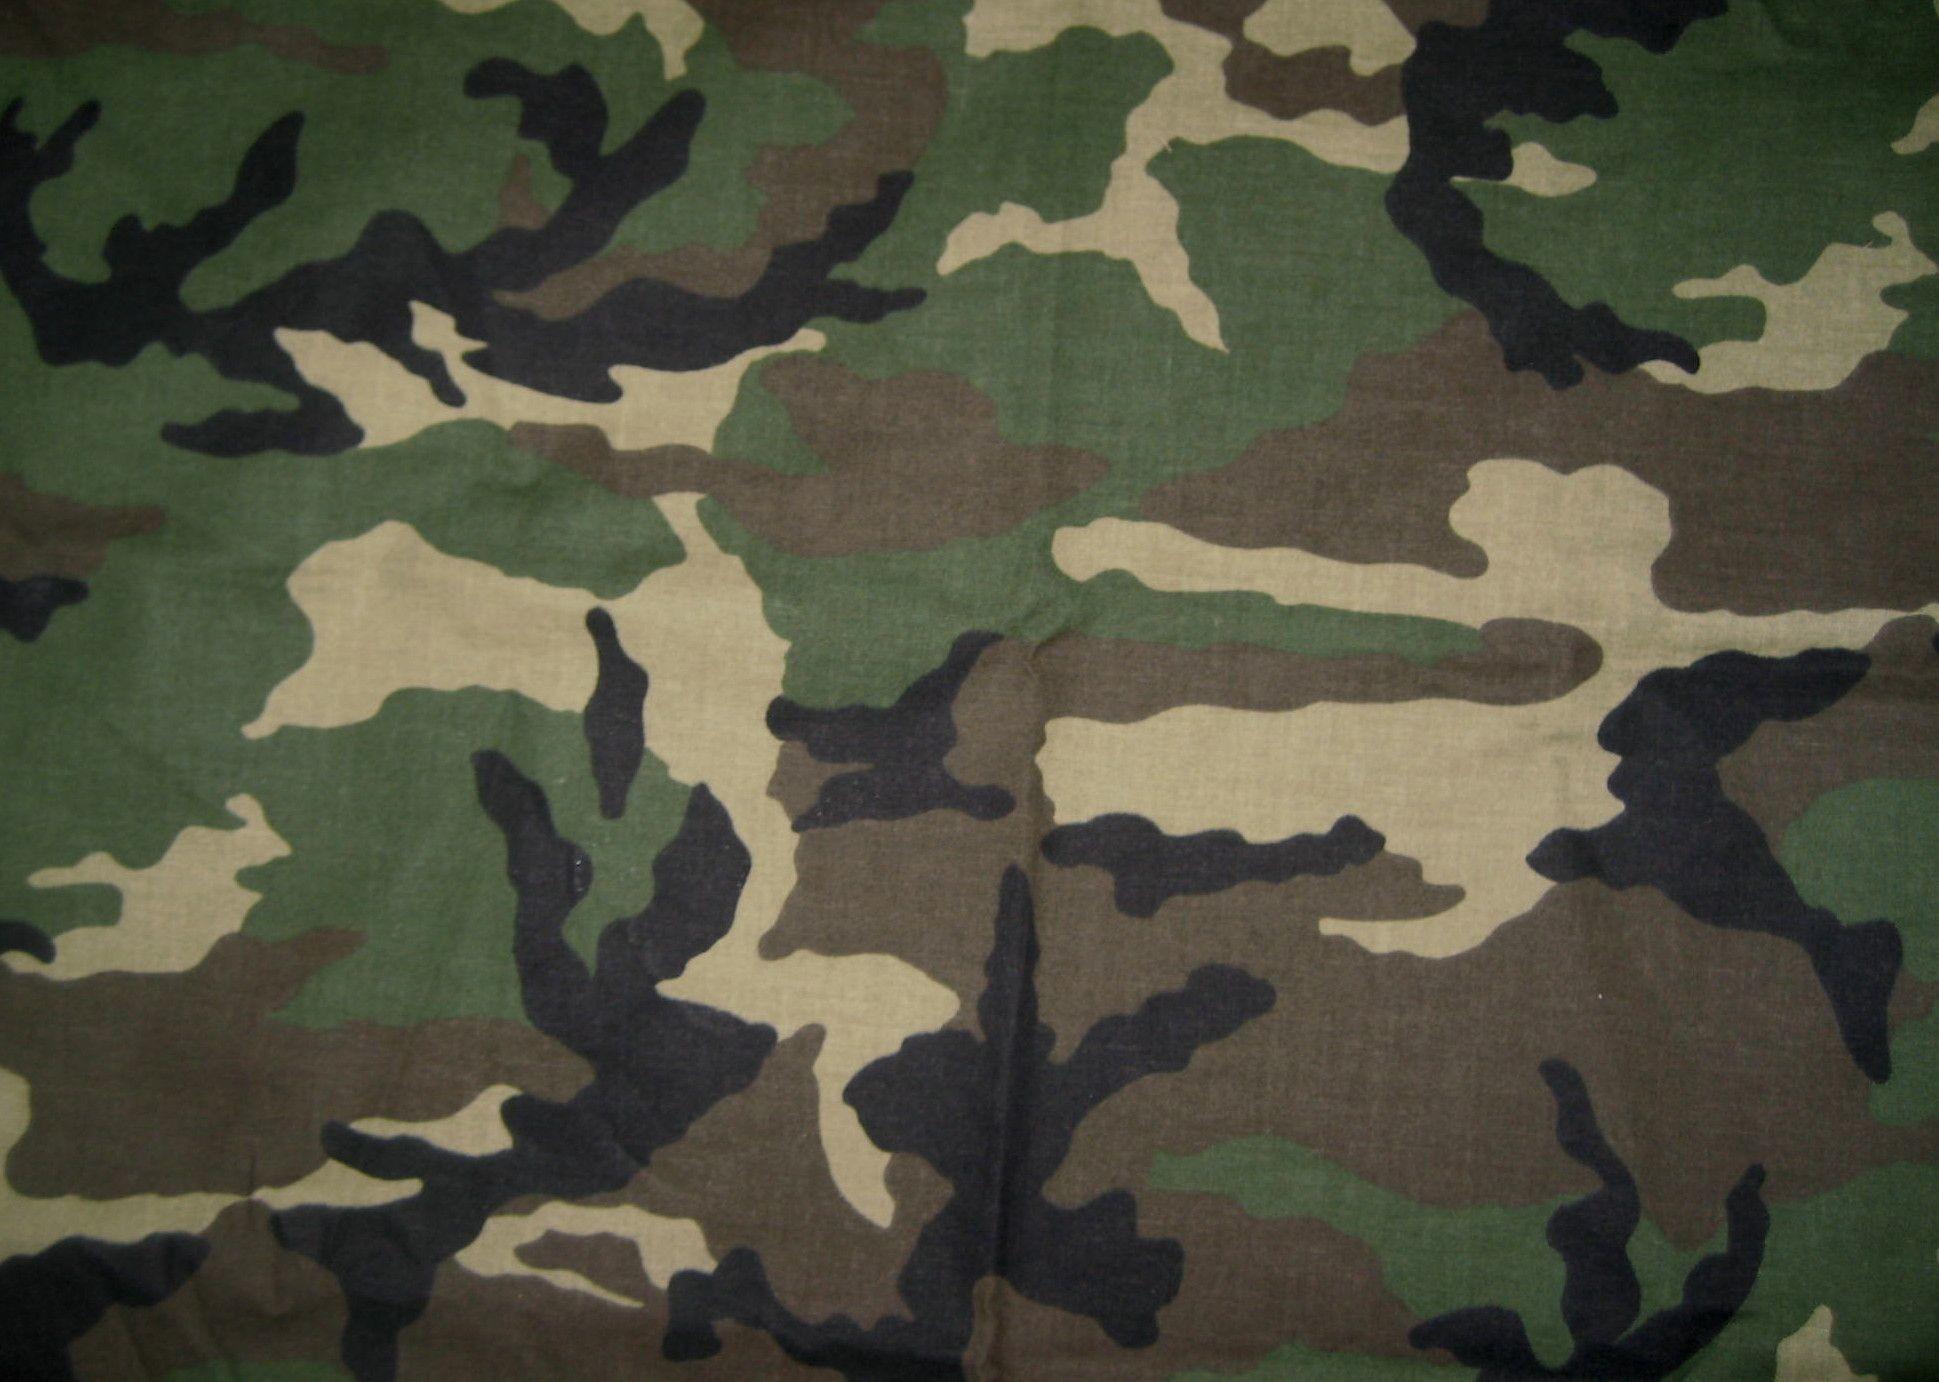 Military Camo Wallpaper Woodland camo wallpapers wallpaper cave #6422